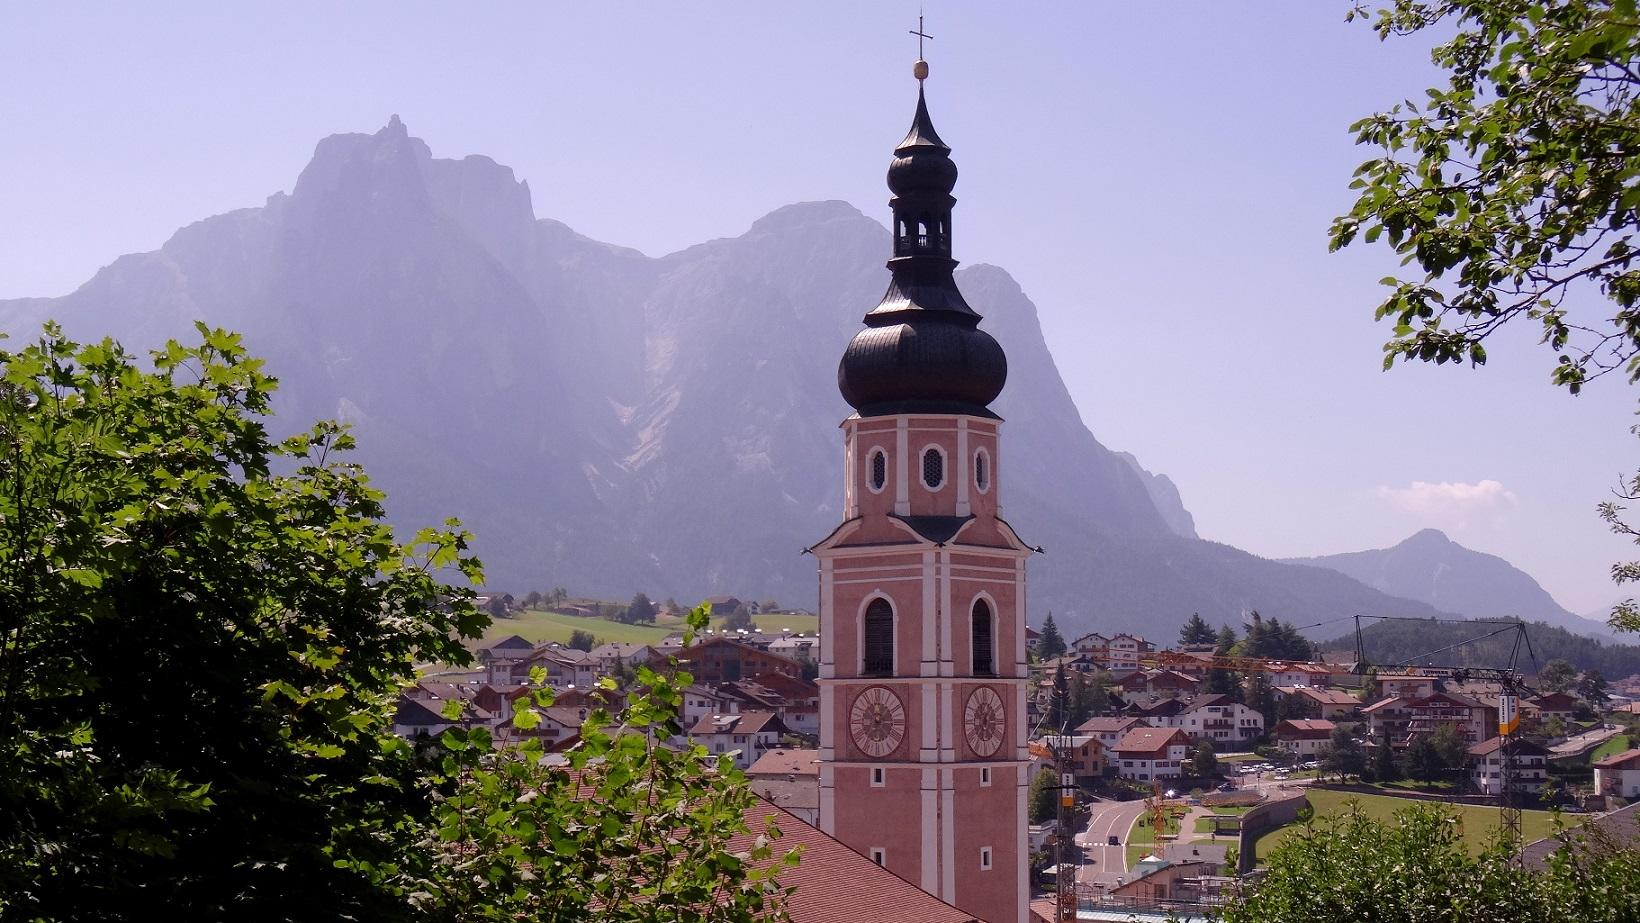 Eglise de Kastelruth - Castelrotto